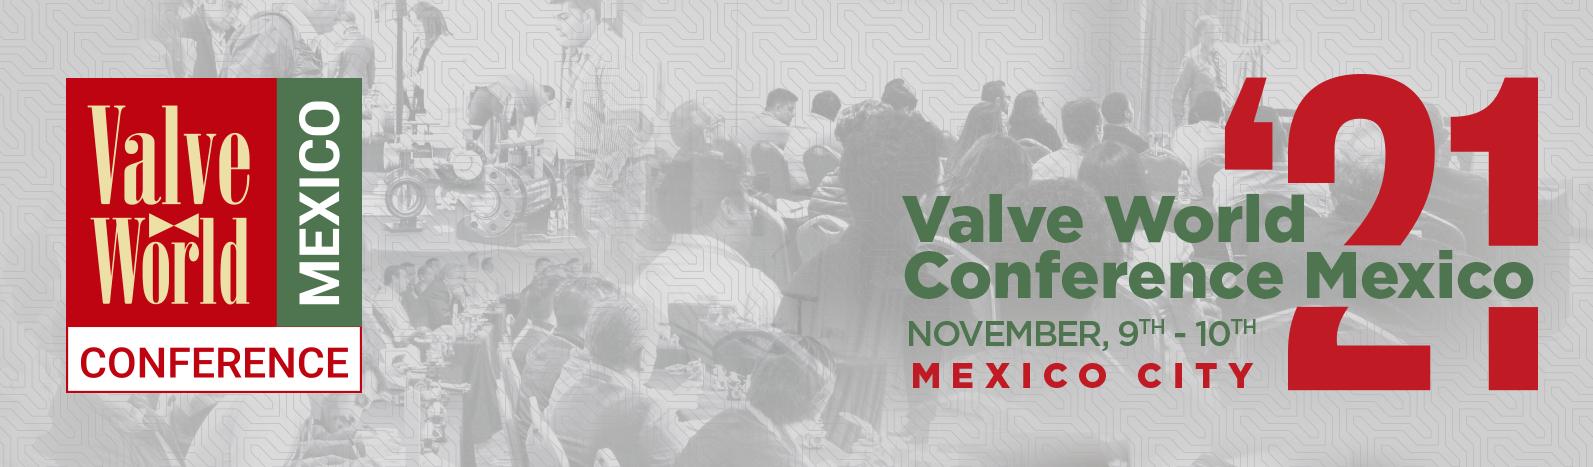 Valve World Conference Mexico 2021